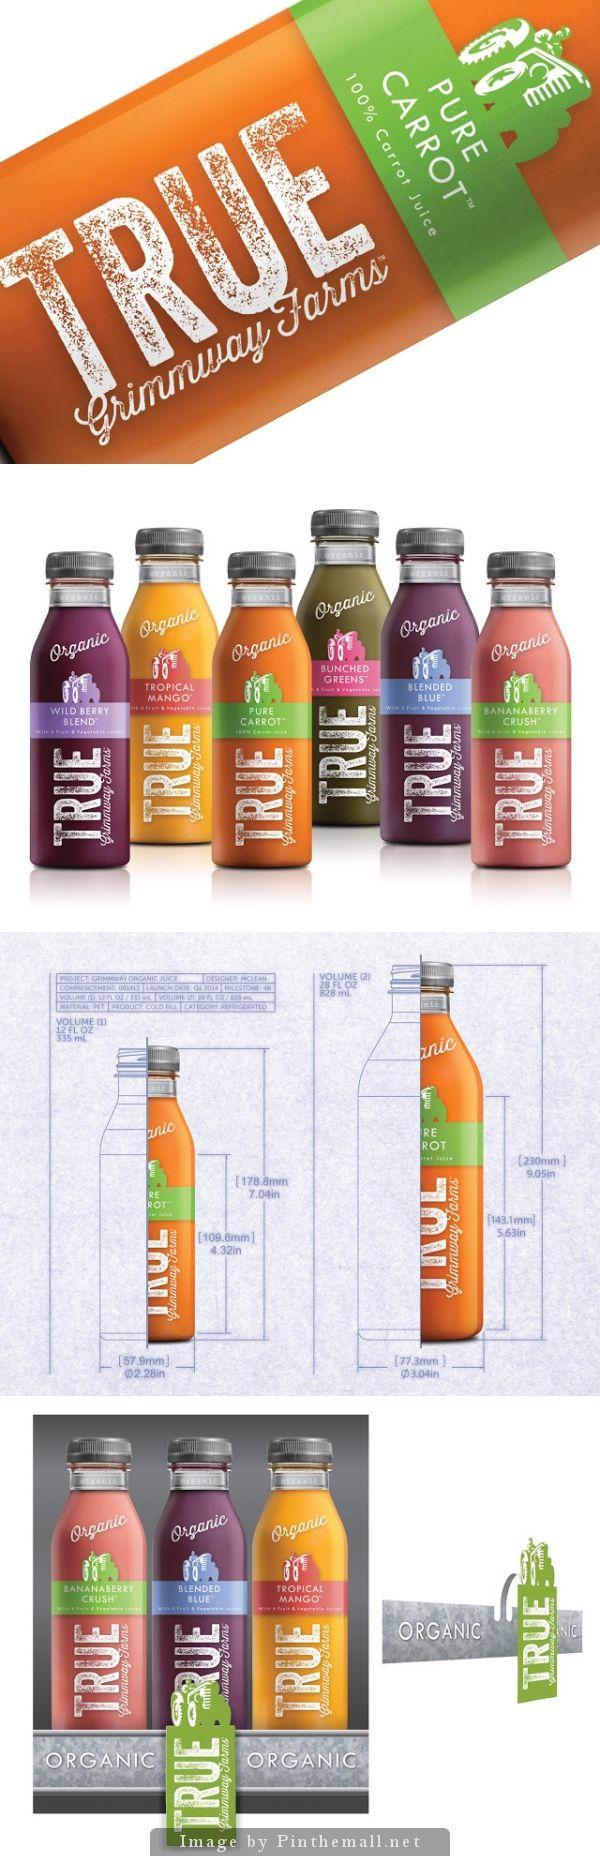 True Organic #Juice - Creative Agency: McLean Design on Packaging of the World